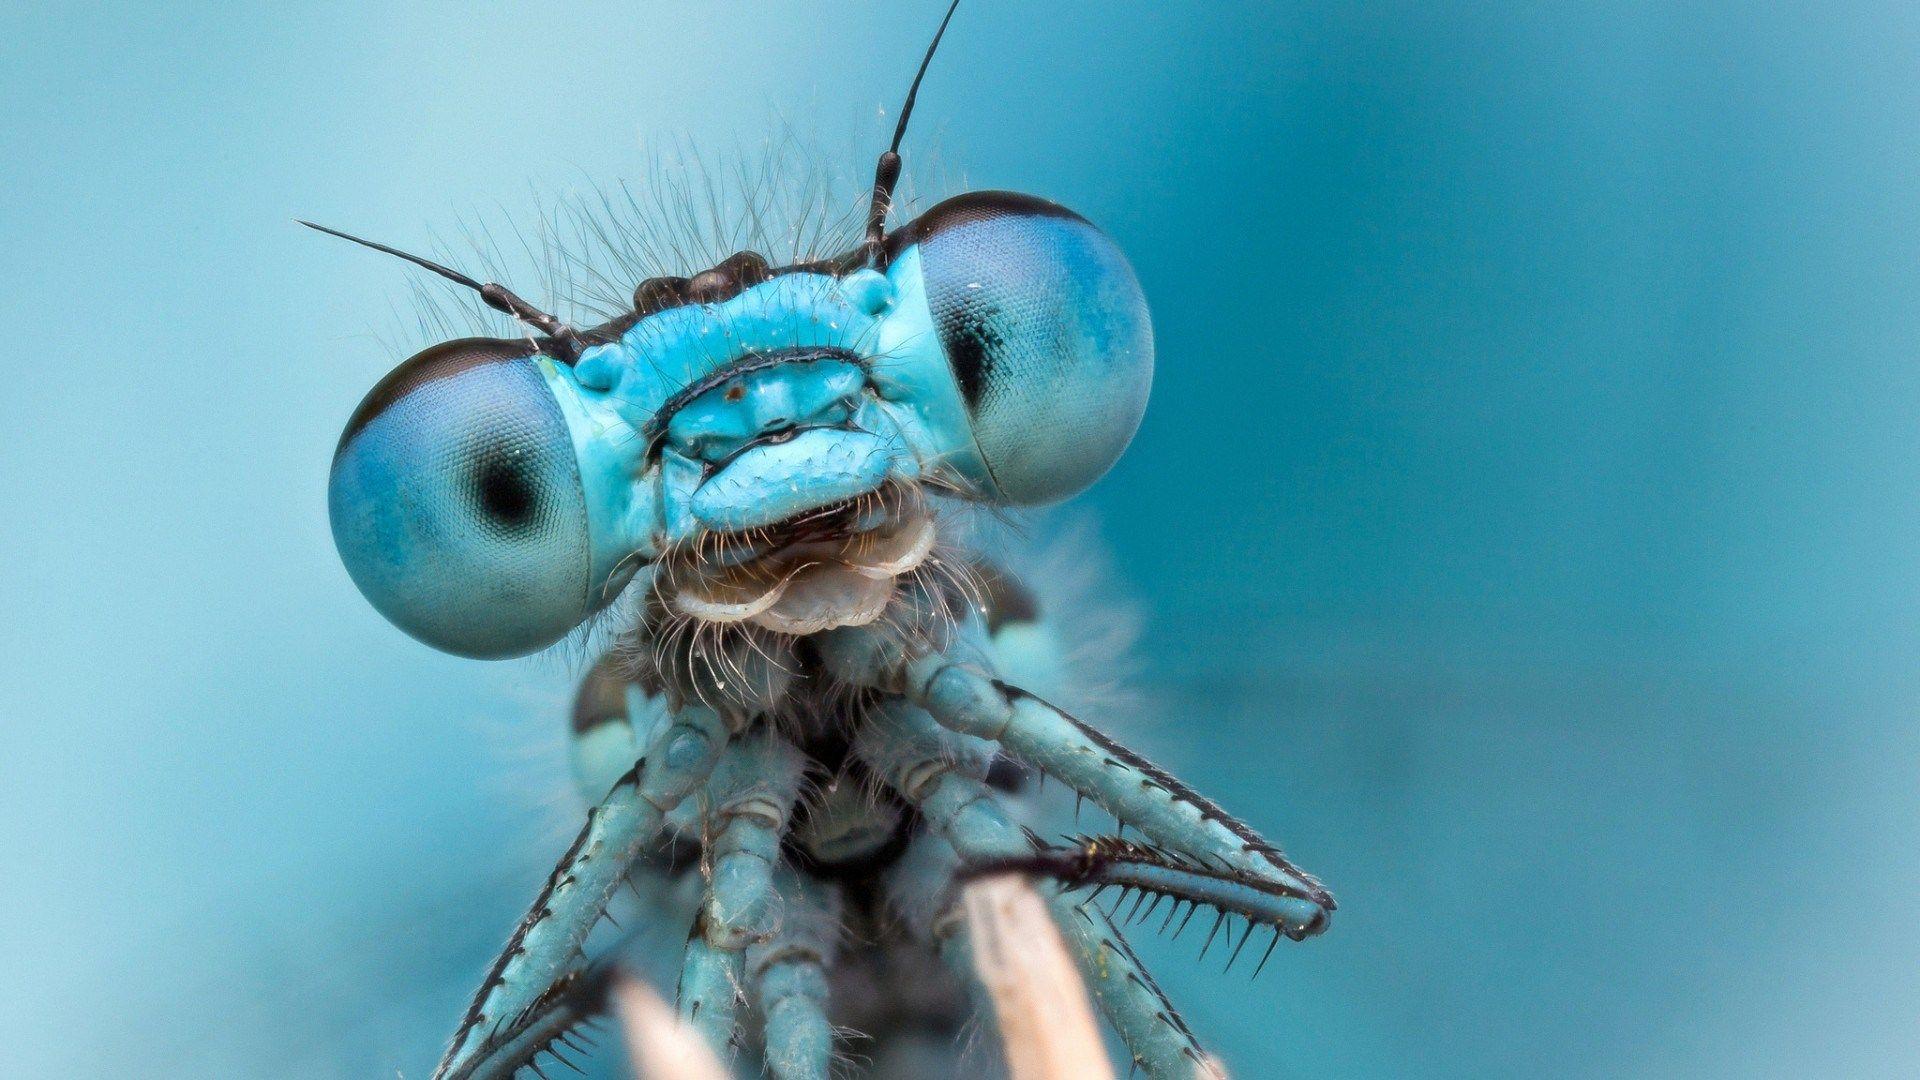 dragonfly super macro photo blue wide hd wallpaper - wpwide